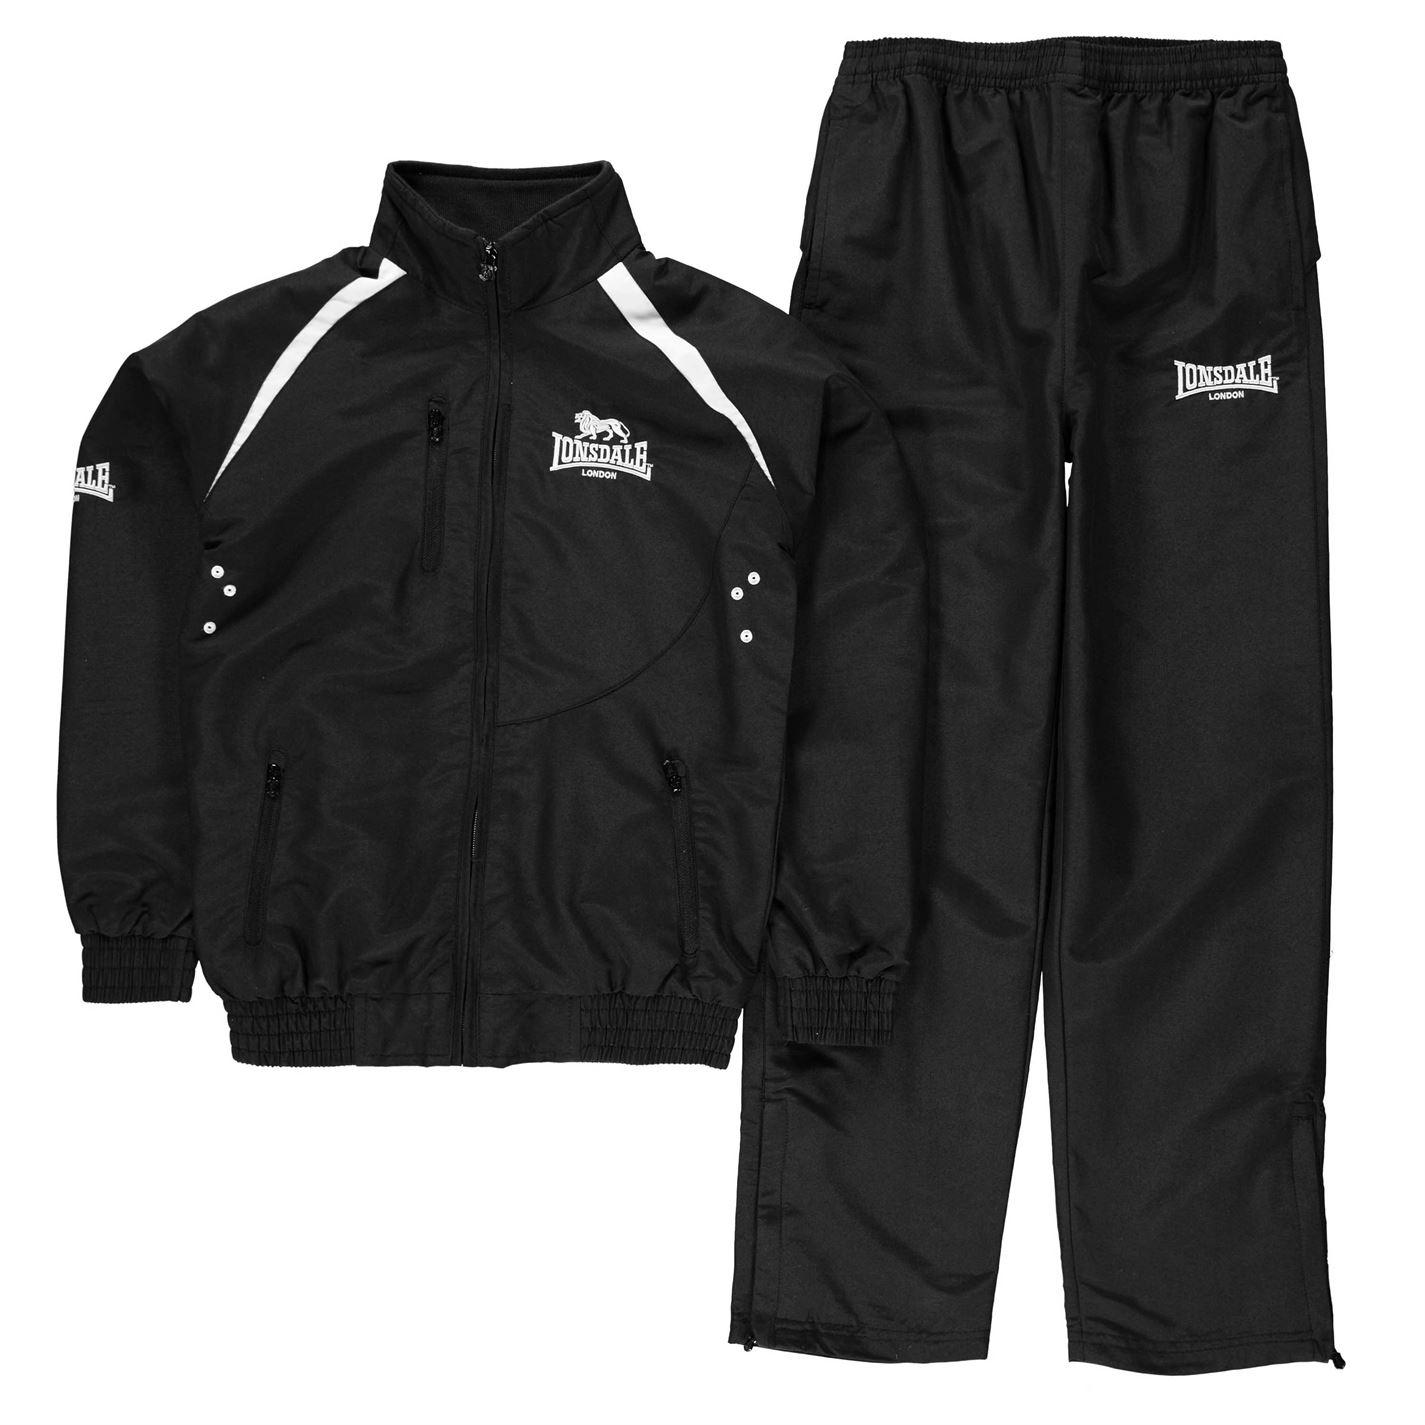 Lonsdale Team Track Suit Junior